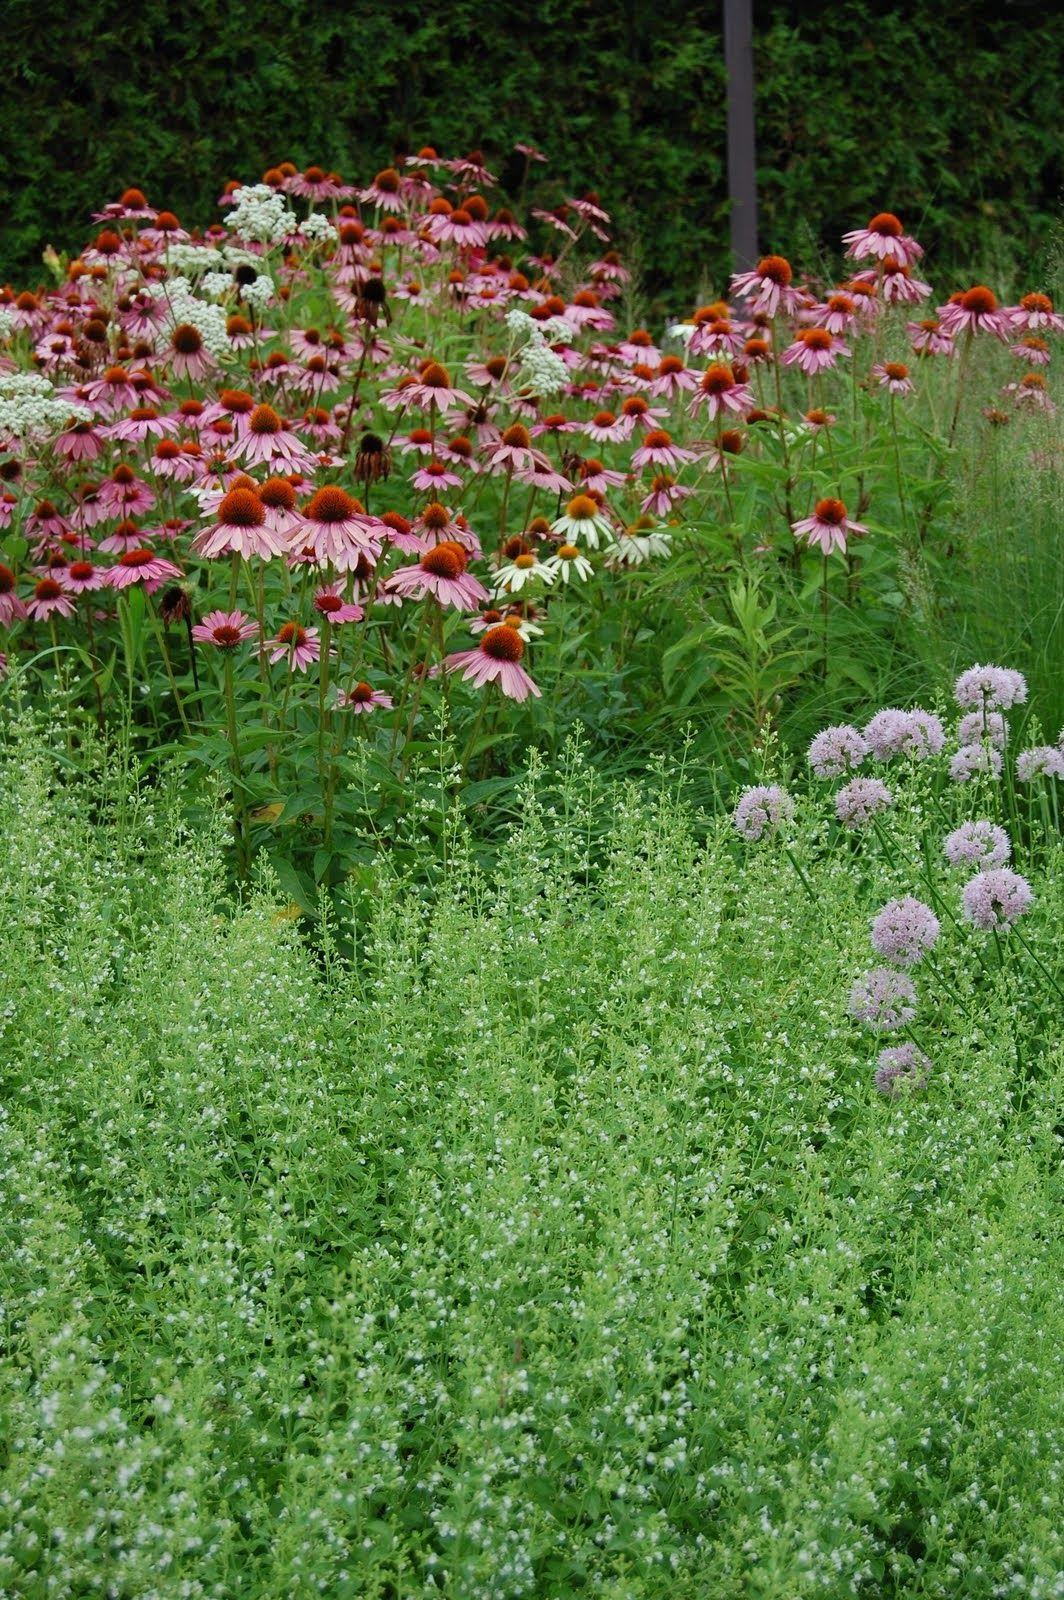 gardener in a forest: my day with roy diblik | outdoor | pinterest, Gartengerate ideen